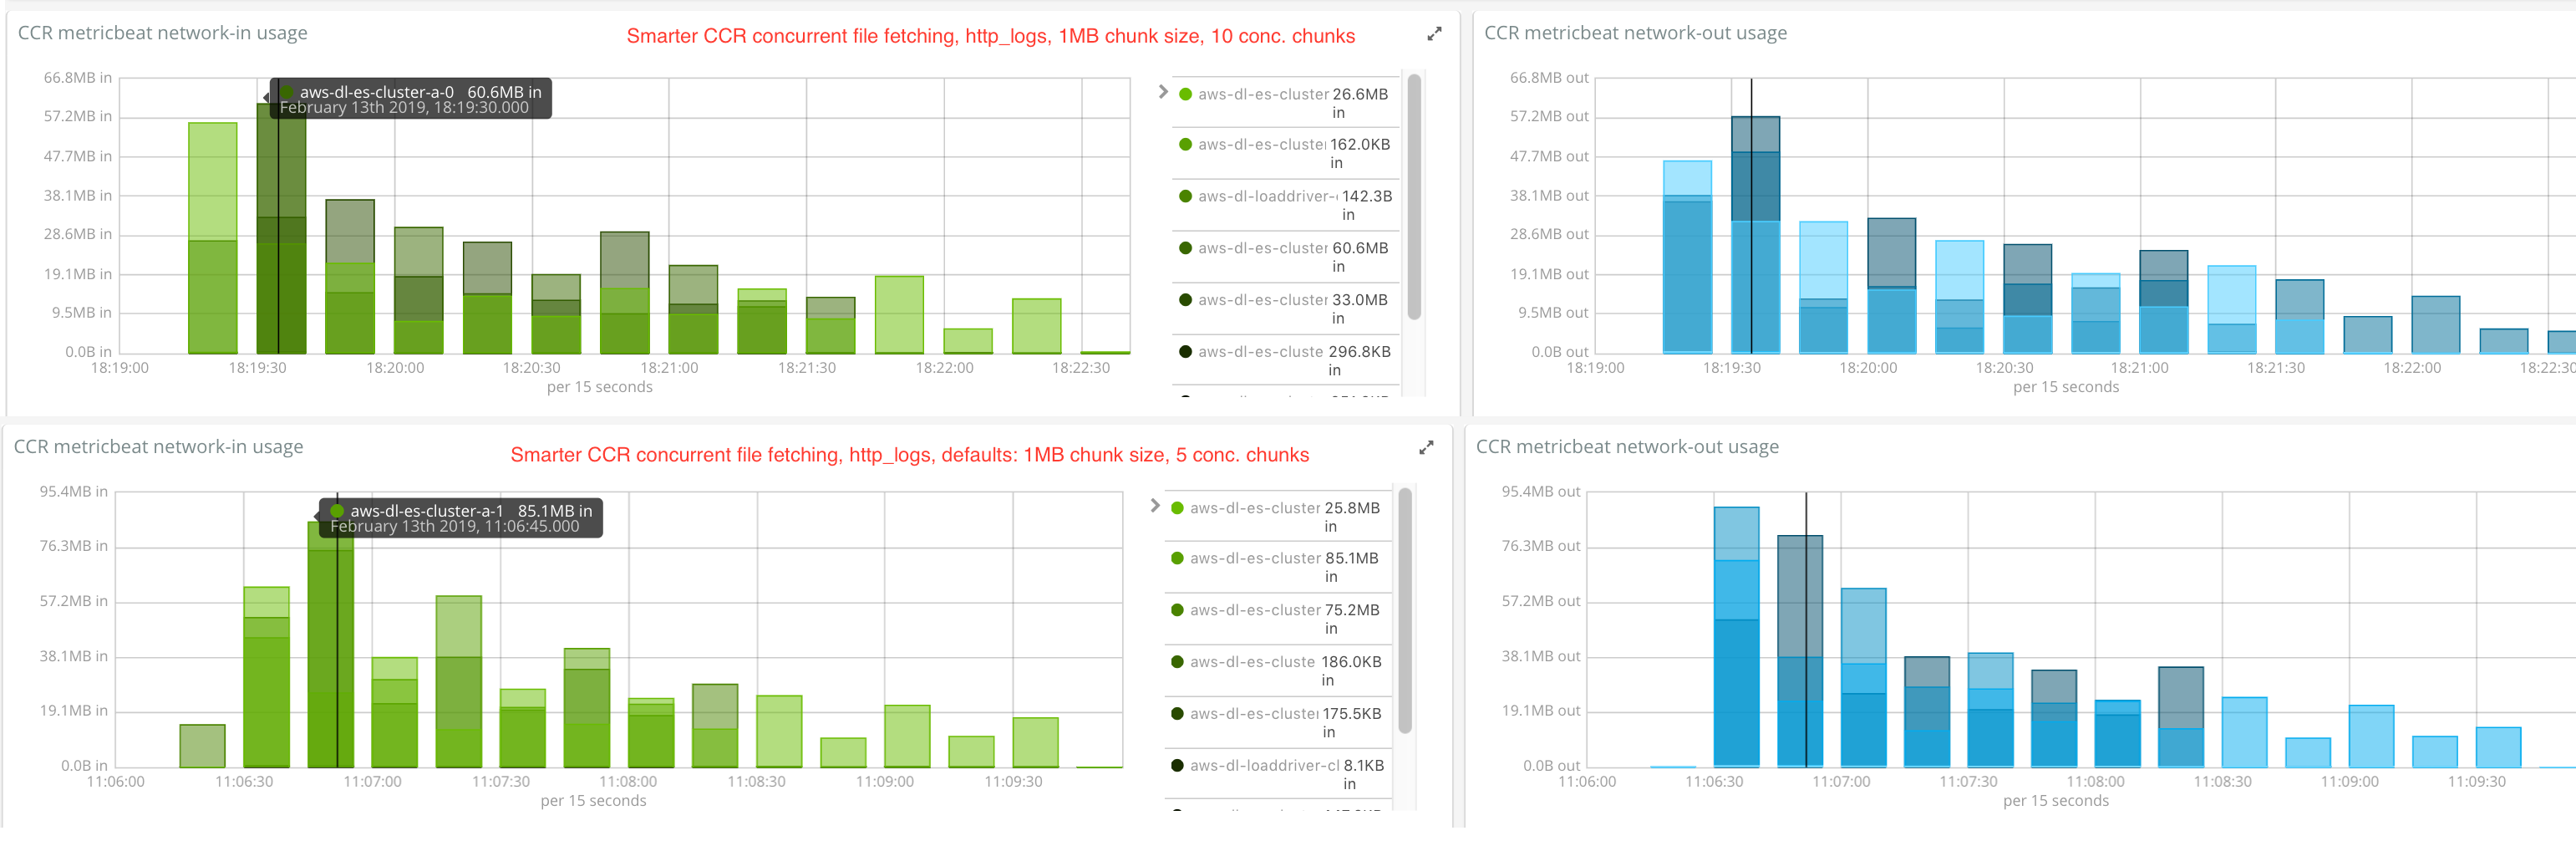 http_logs_compare_smart_fetch_5_vs_10_max_concurrent_file_chunks